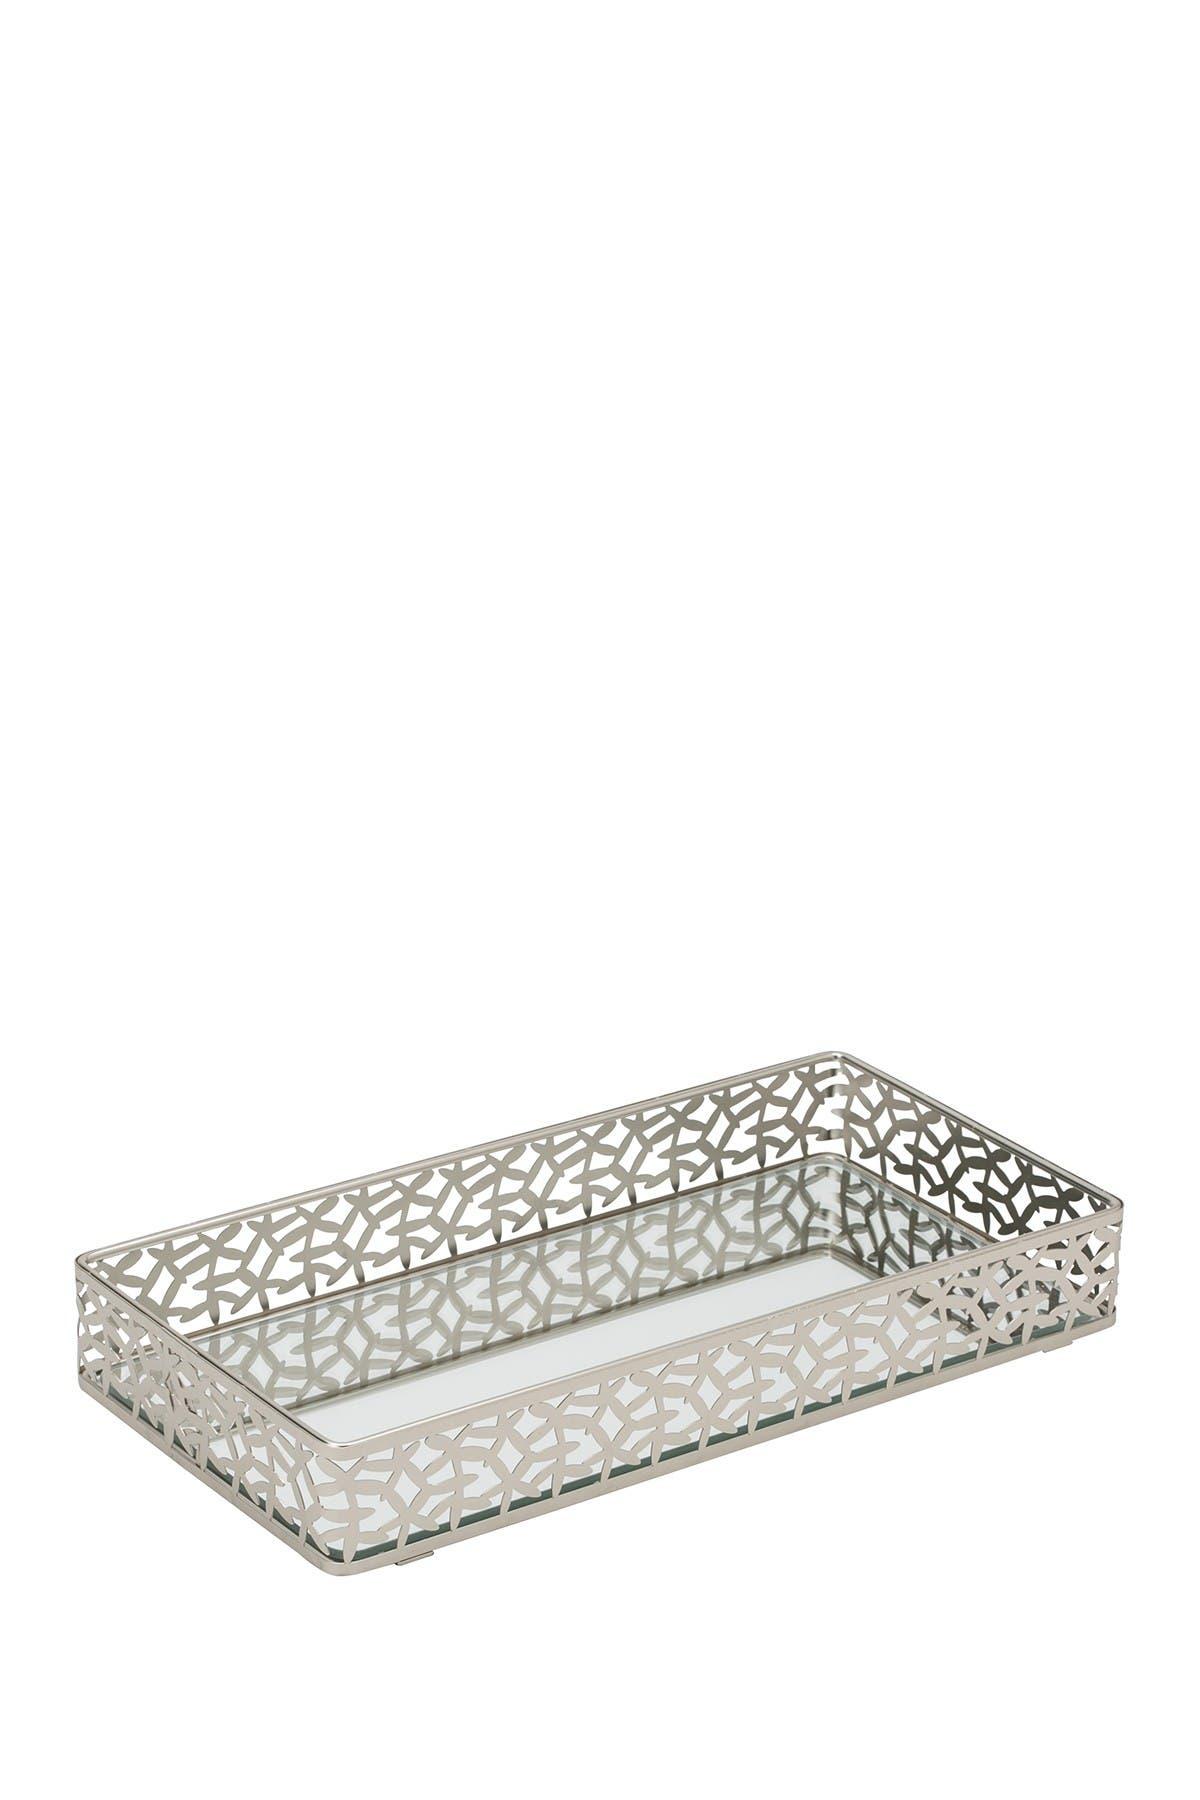 Kennedy International Inc Home Details Leaf Design Rectangular Mirror Vanity Tray Nordstrom Rack